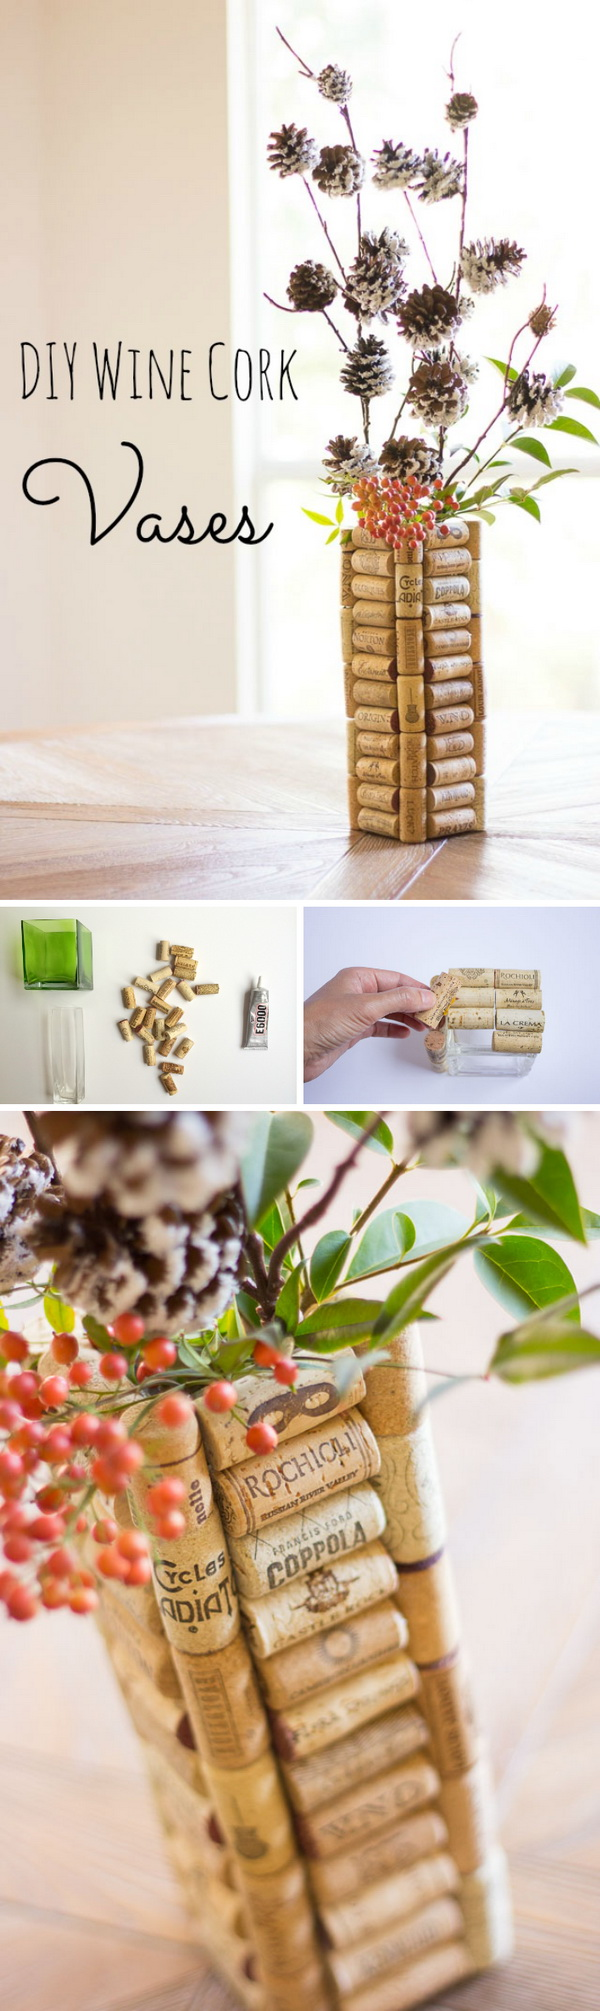 DIY Wine Cork Vases.